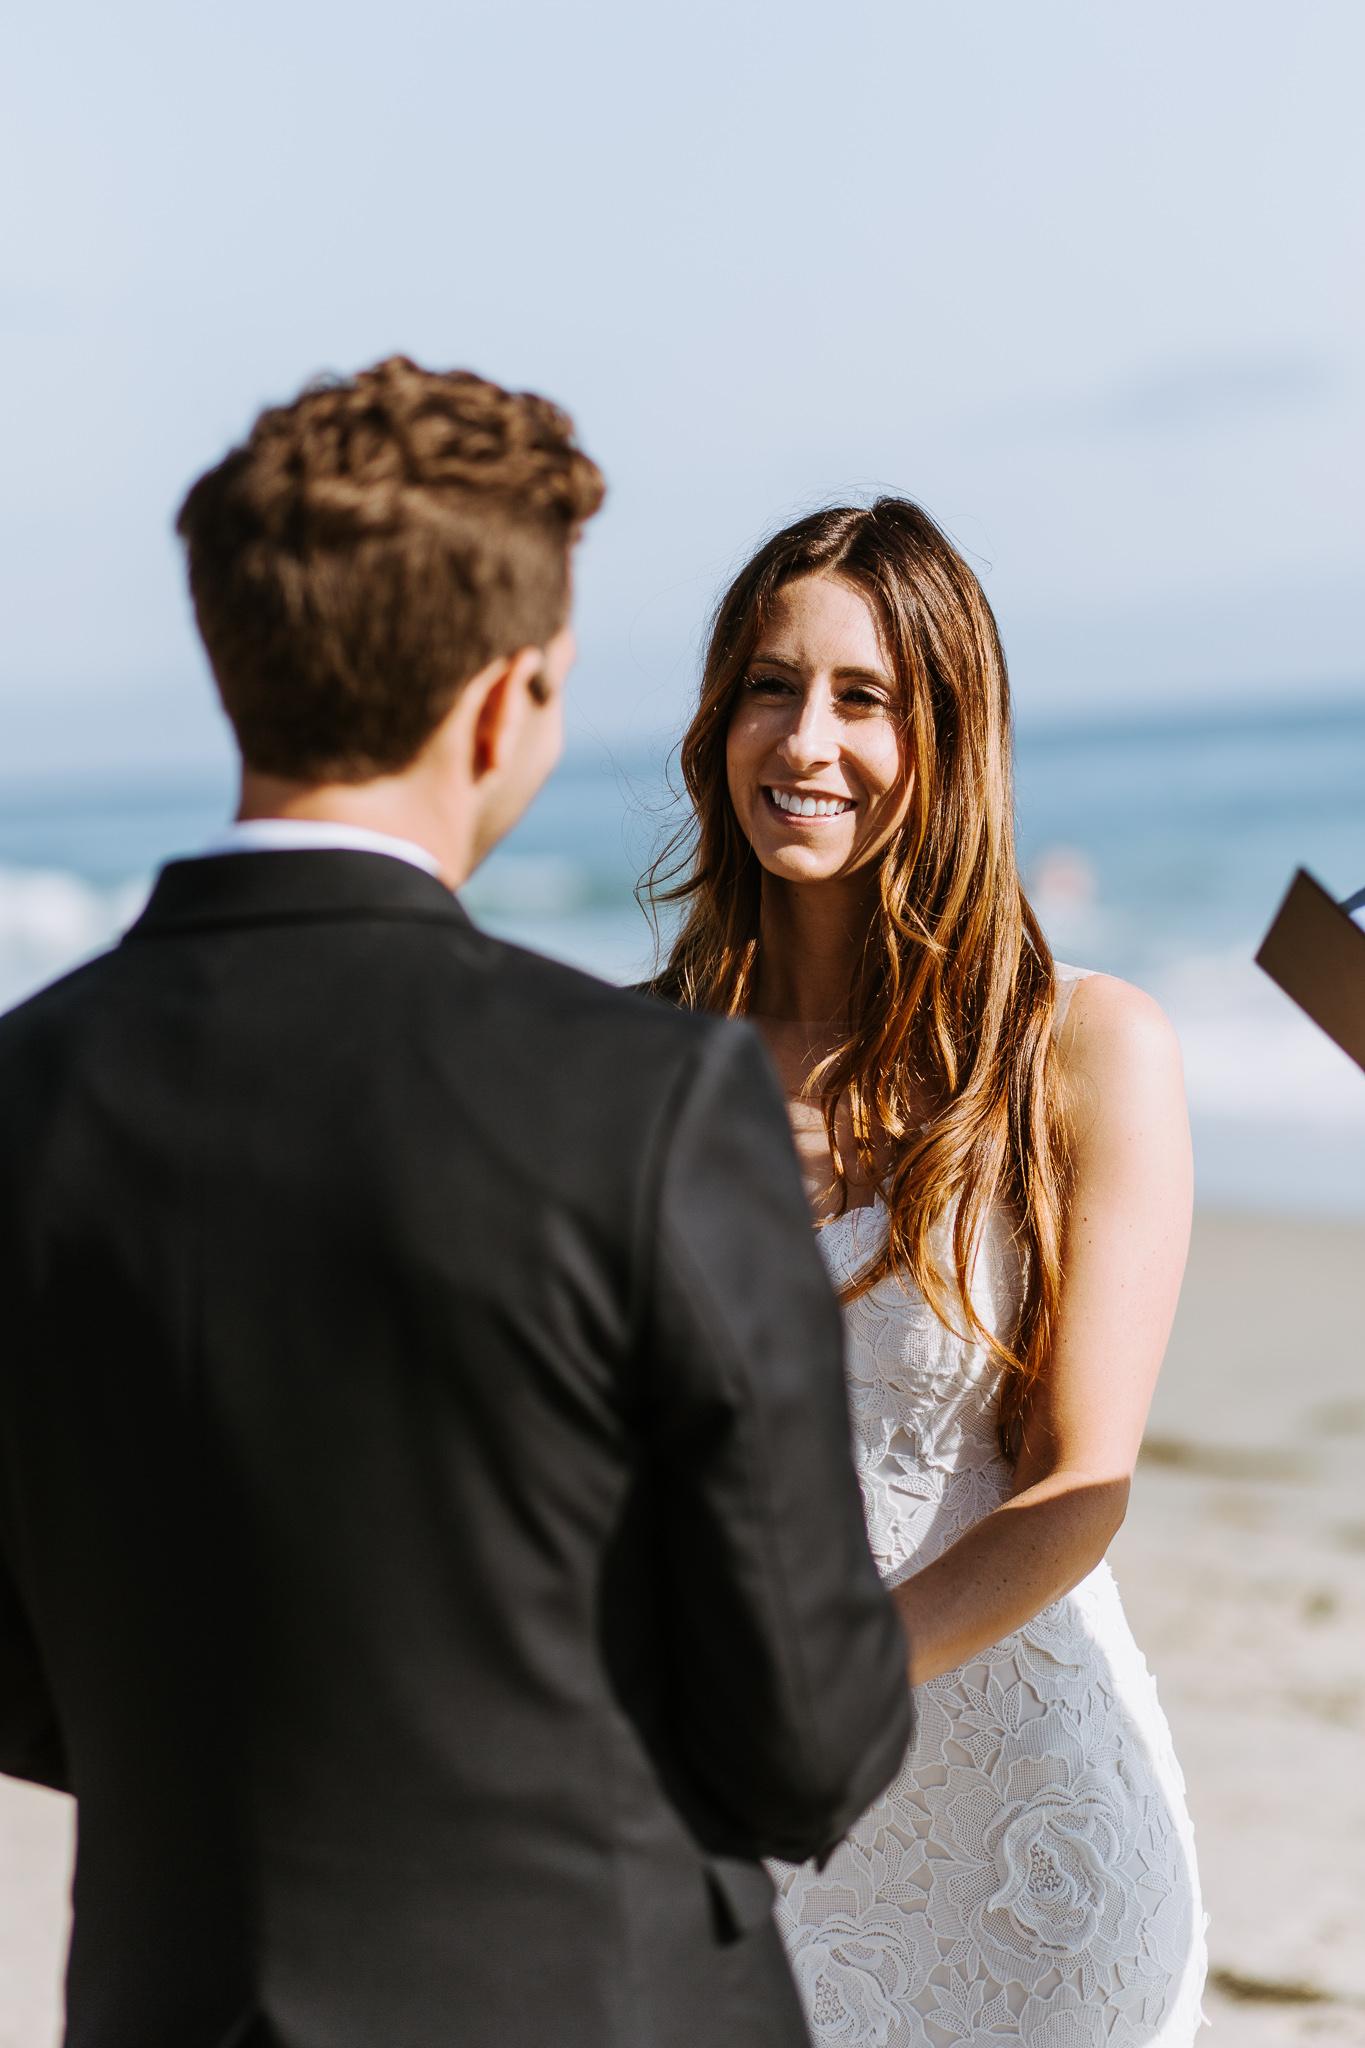 LagunaBeach-WeddingPhotographer-35.jpg